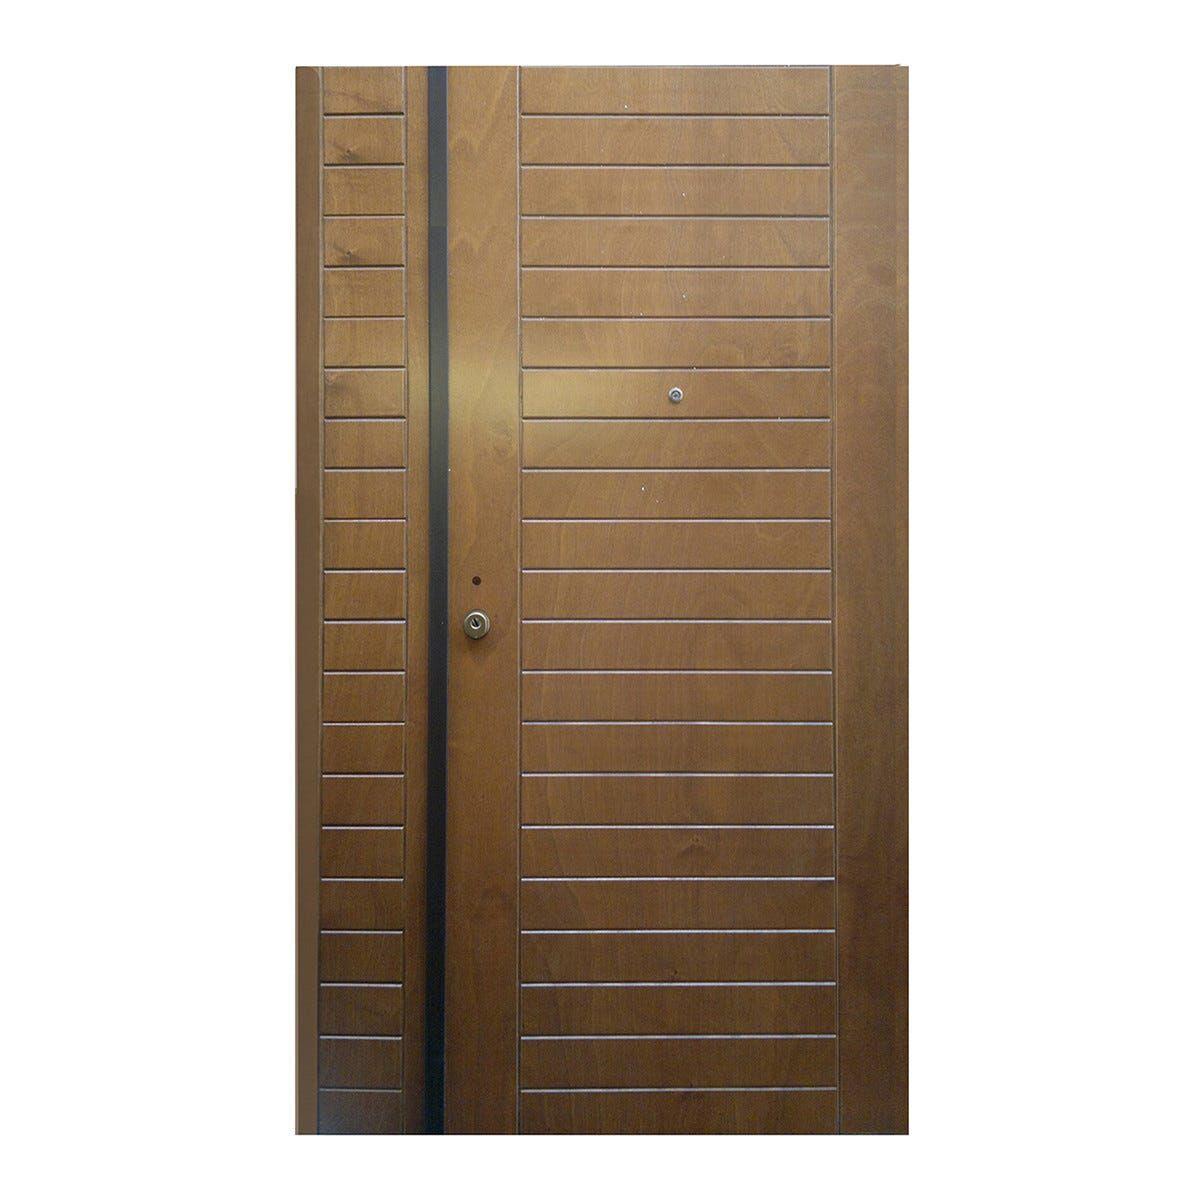 Porta Blindata Hammer Doppia Anta Apertura Spinta A Destra 210x90/30 Cm (Hxl) Classe 3